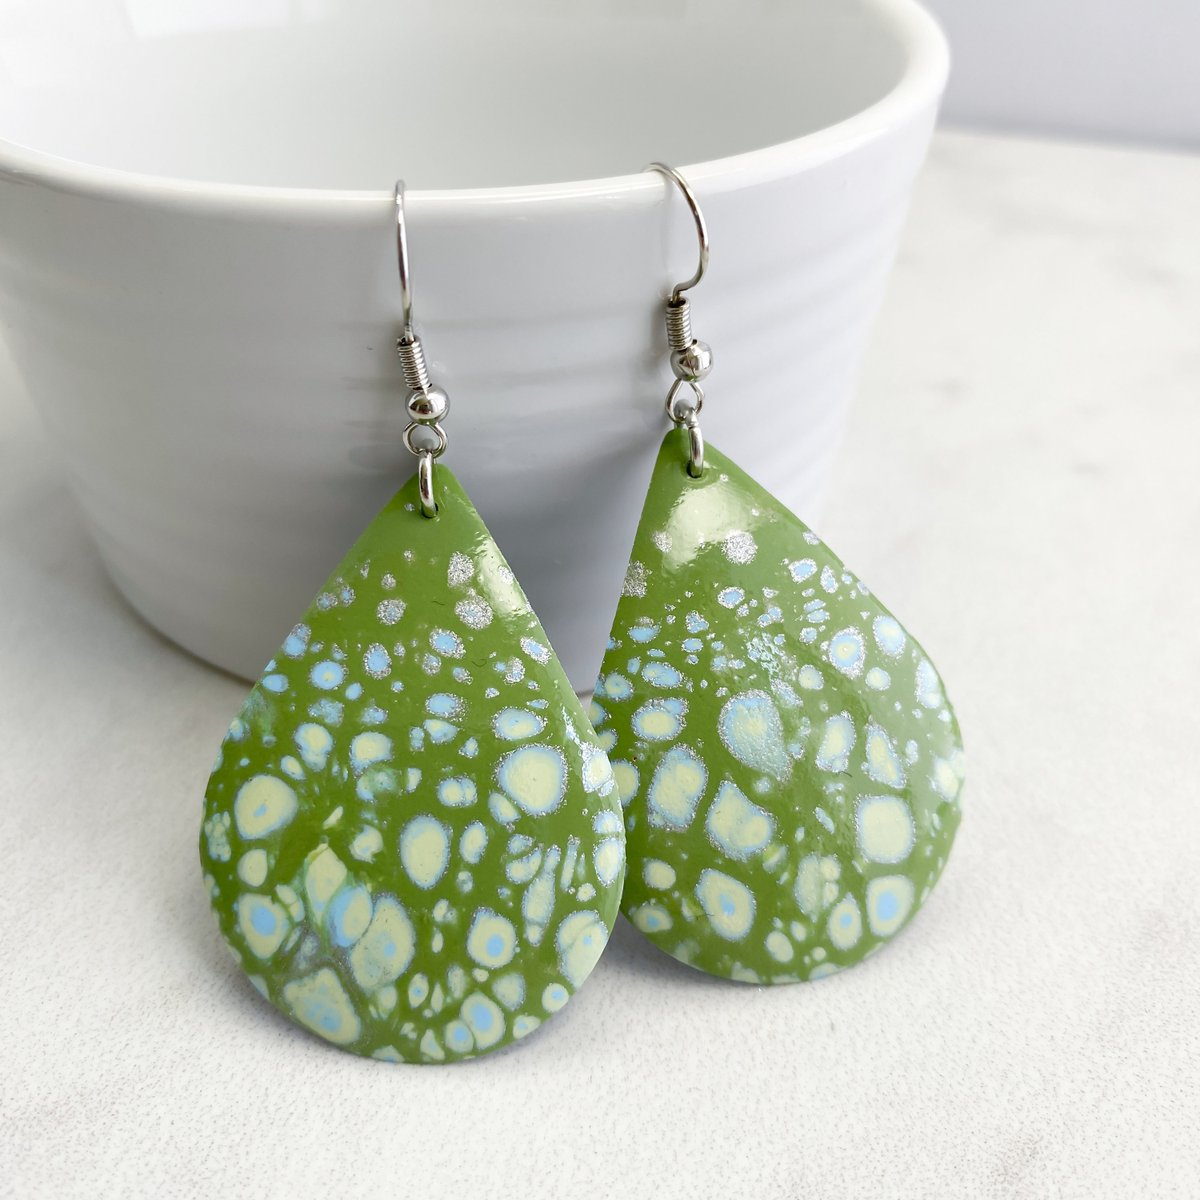 Green Dangle Earrings, Summer Earrings, Handmade Earrings Gift for Her, Gift for Woman, Sage Green Drop Earrings, Free Shipping Style 155 https://t.co/cRD0i4AZXm #style #shopping #shopsmall #etsyshop #gifts #ecommerce #smallbiz #etsy https://t.co/pPwrBFOrAK